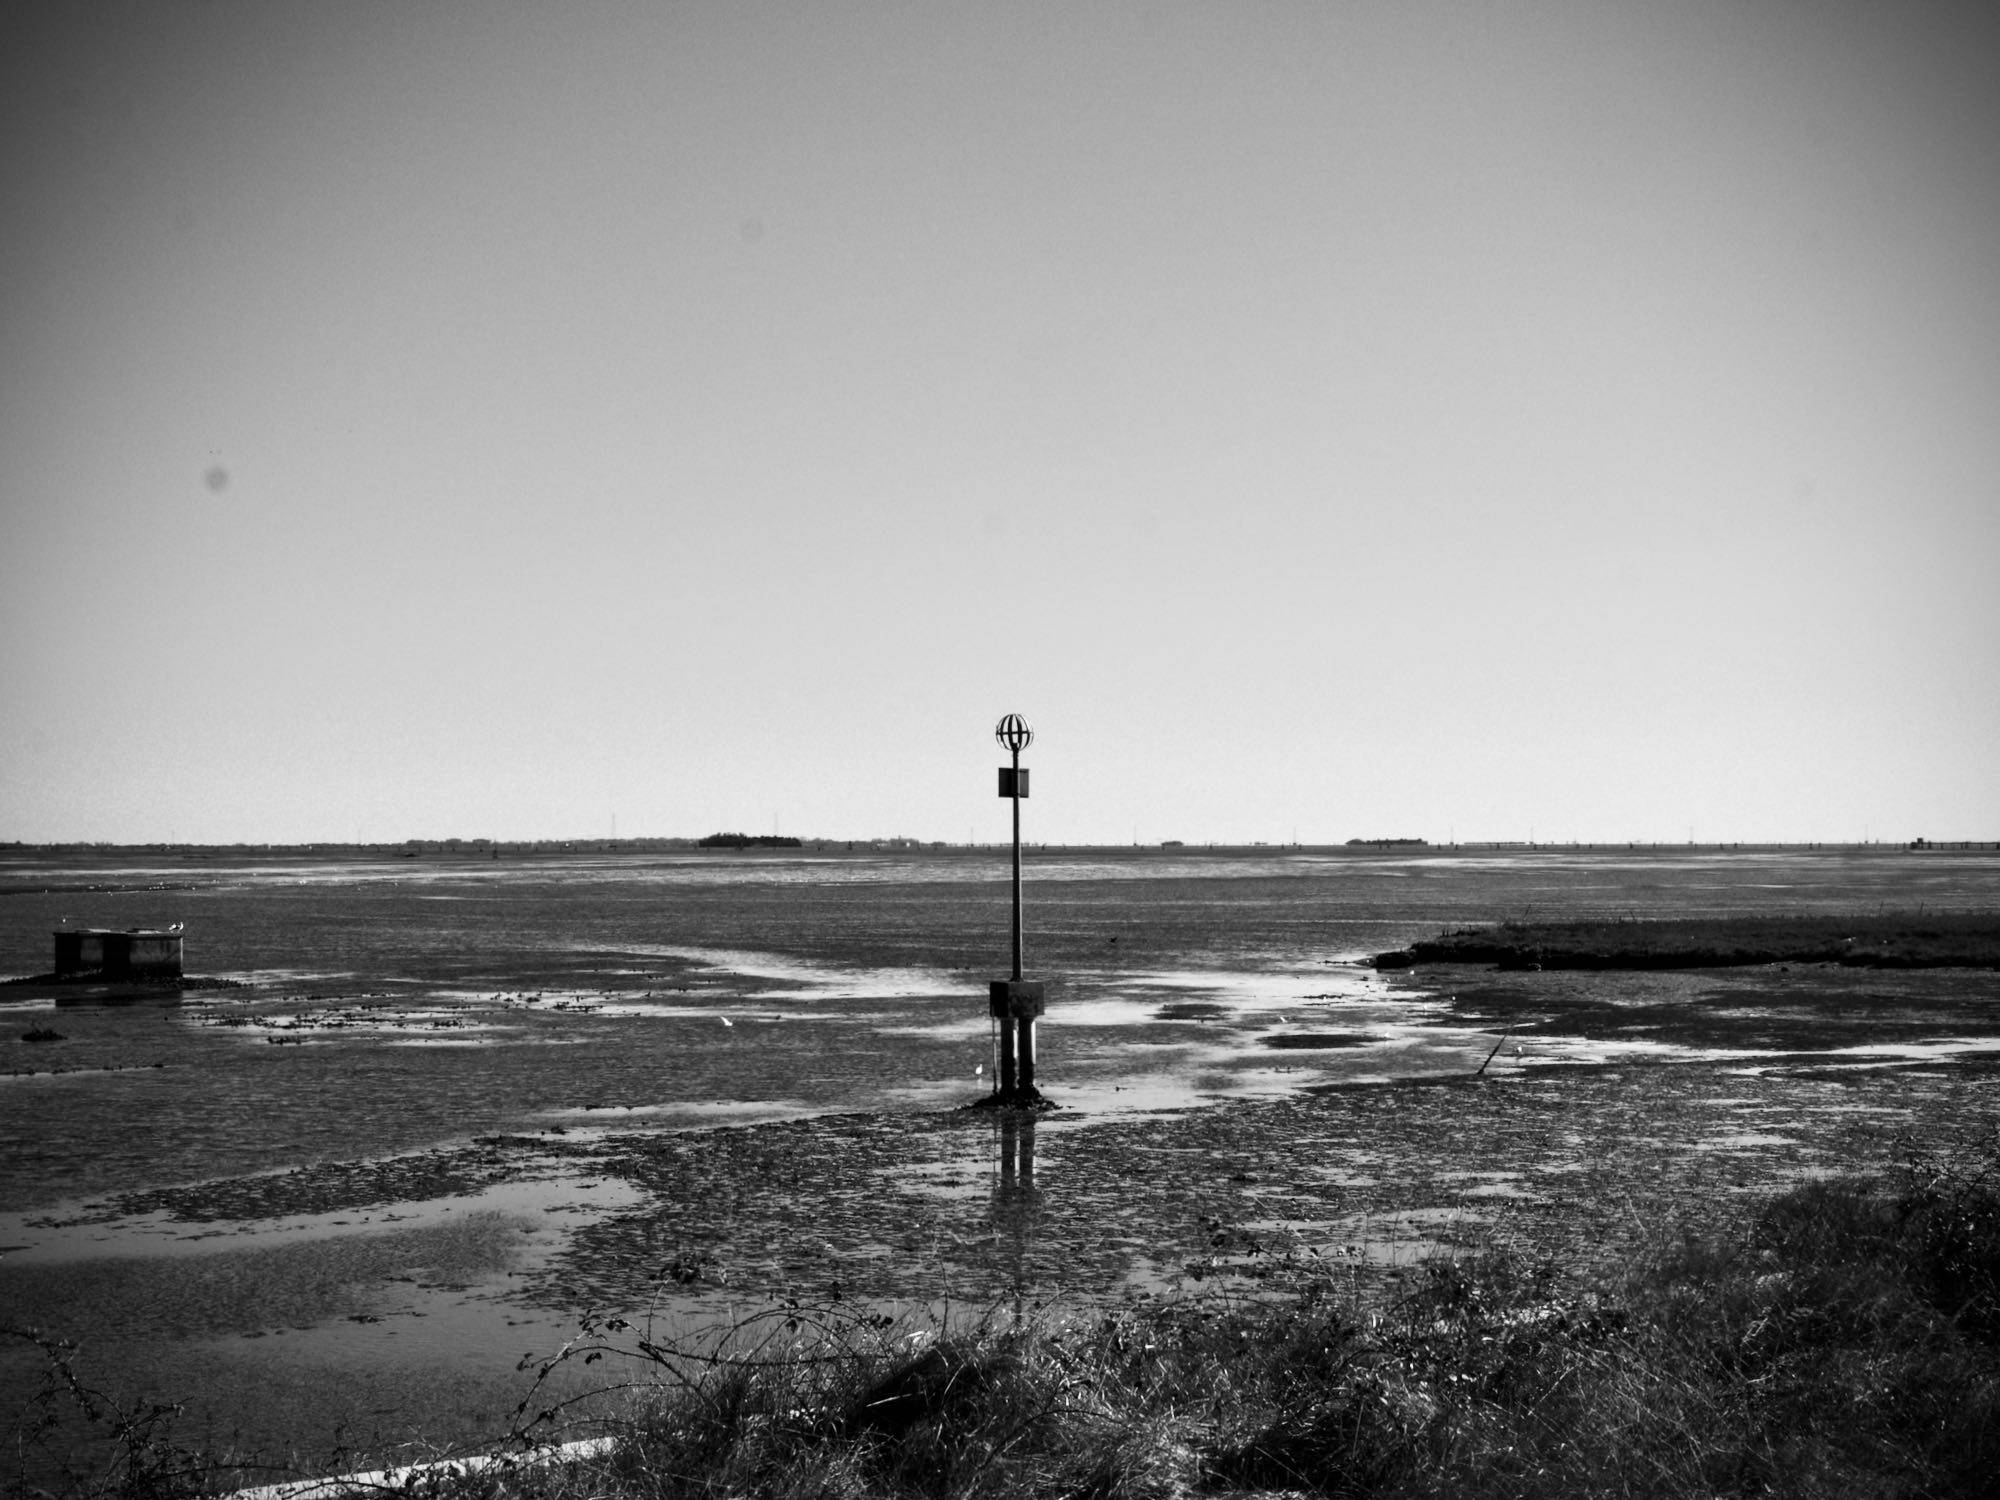 Massimiliano Scarpa_photographer_Venezia_Porto Marghera_2662017 - 1 (4)525-66377-33568526